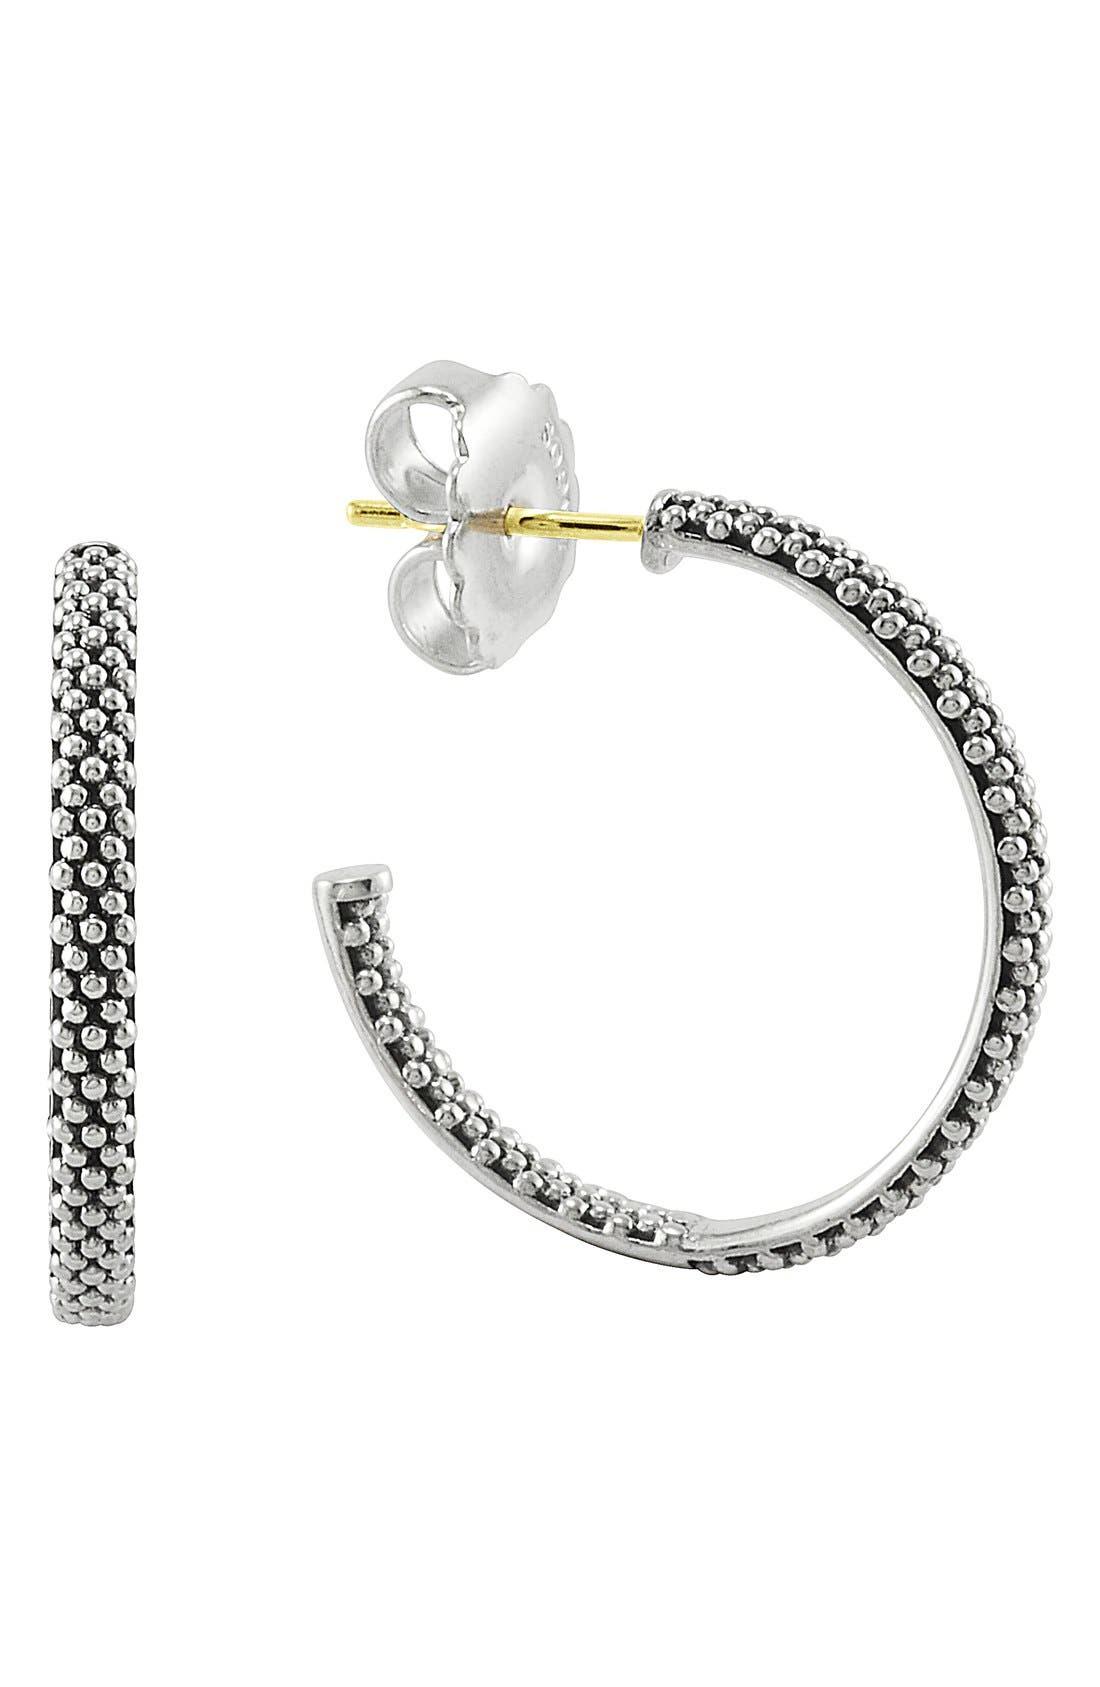 Caviar Hoop Earrings,                             Main thumbnail 1, color,                             Sterling Silver